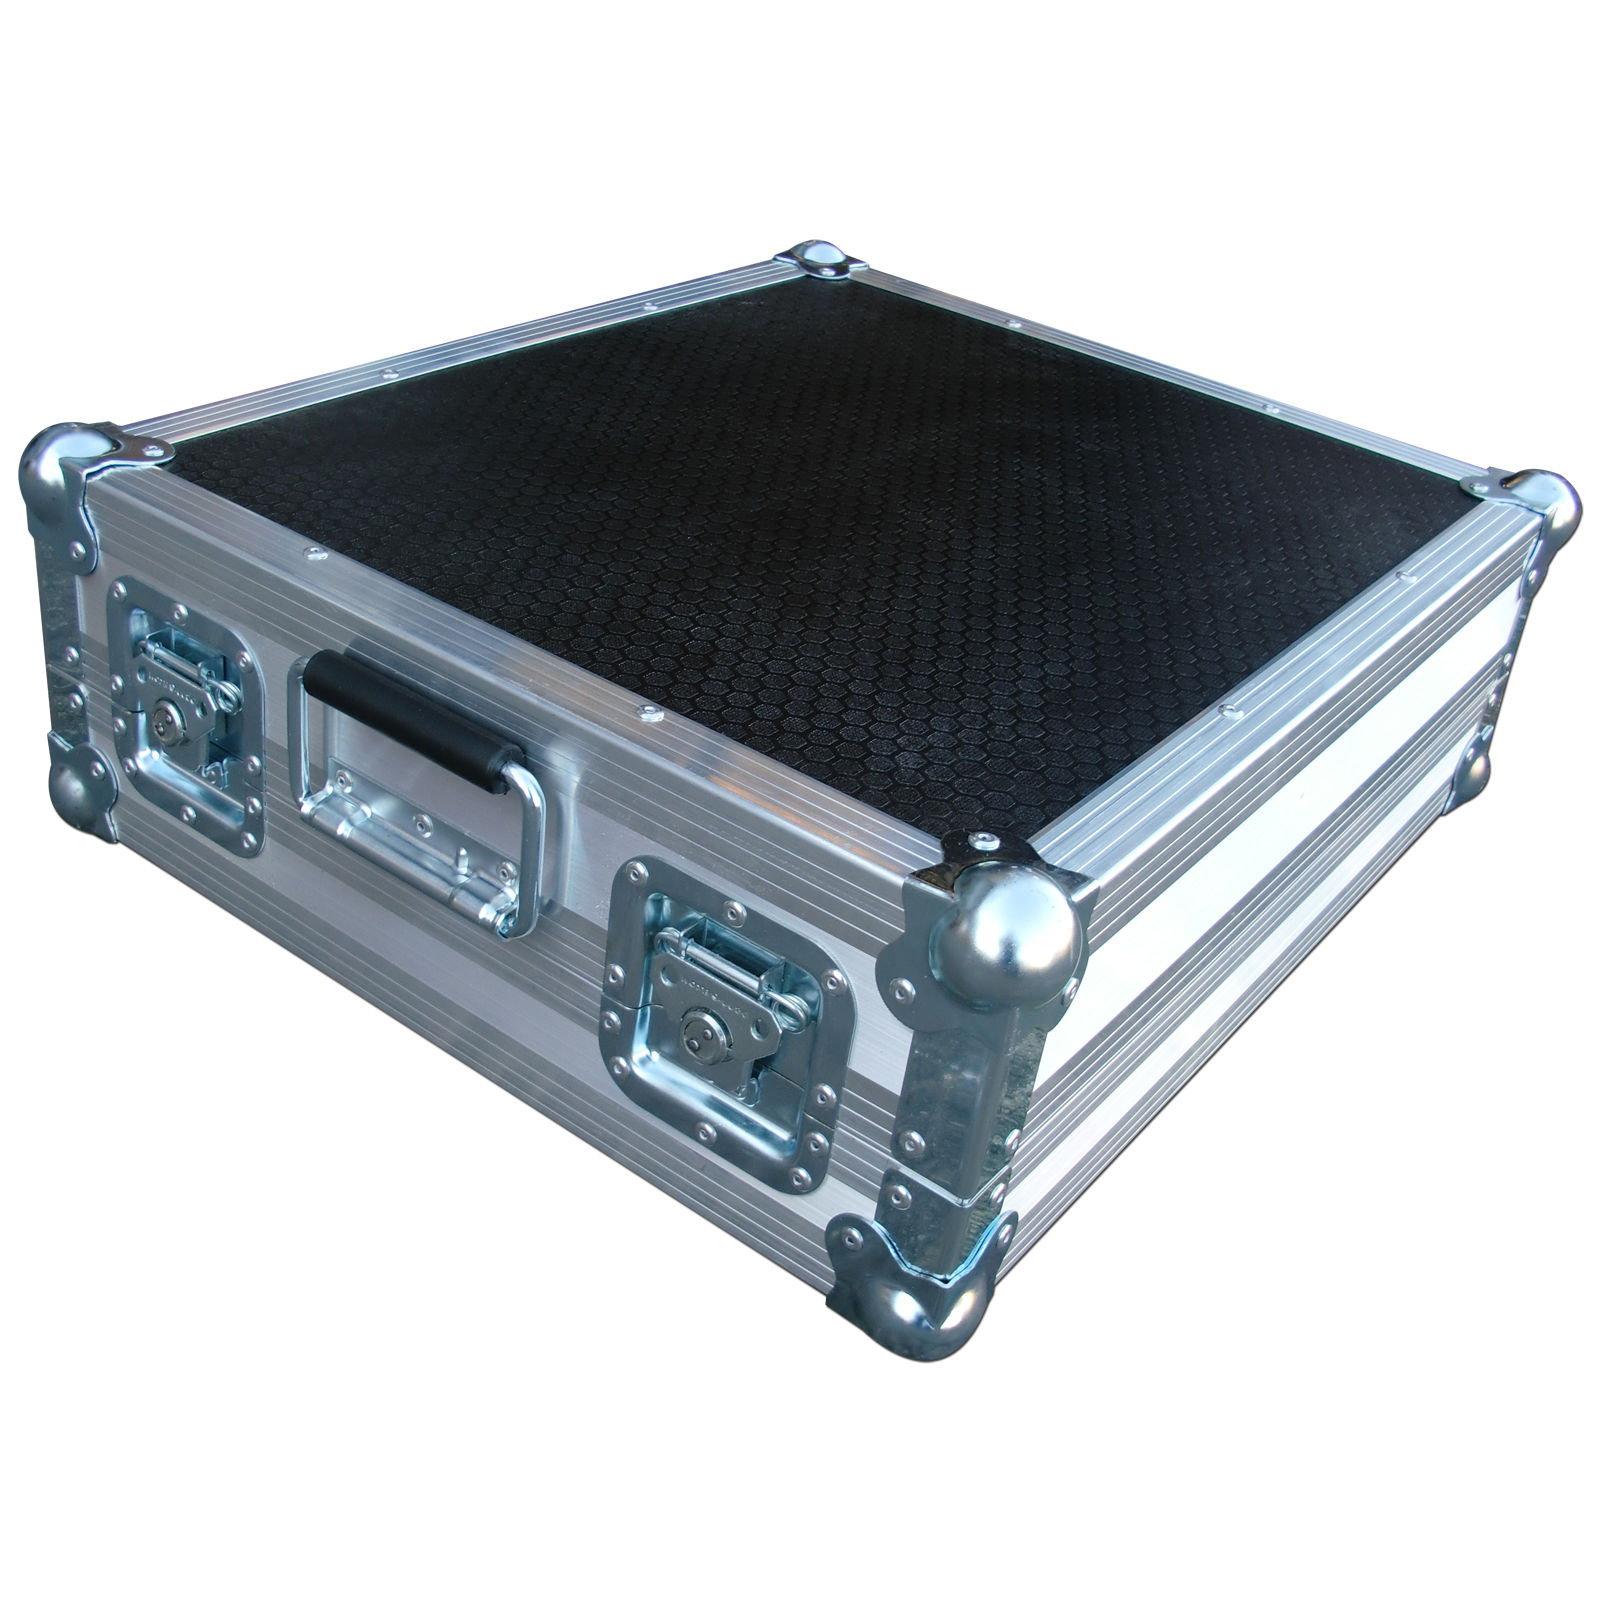 mackie dfx 6 mixer flight case. Black Bedroom Furniture Sets. Home Design Ideas